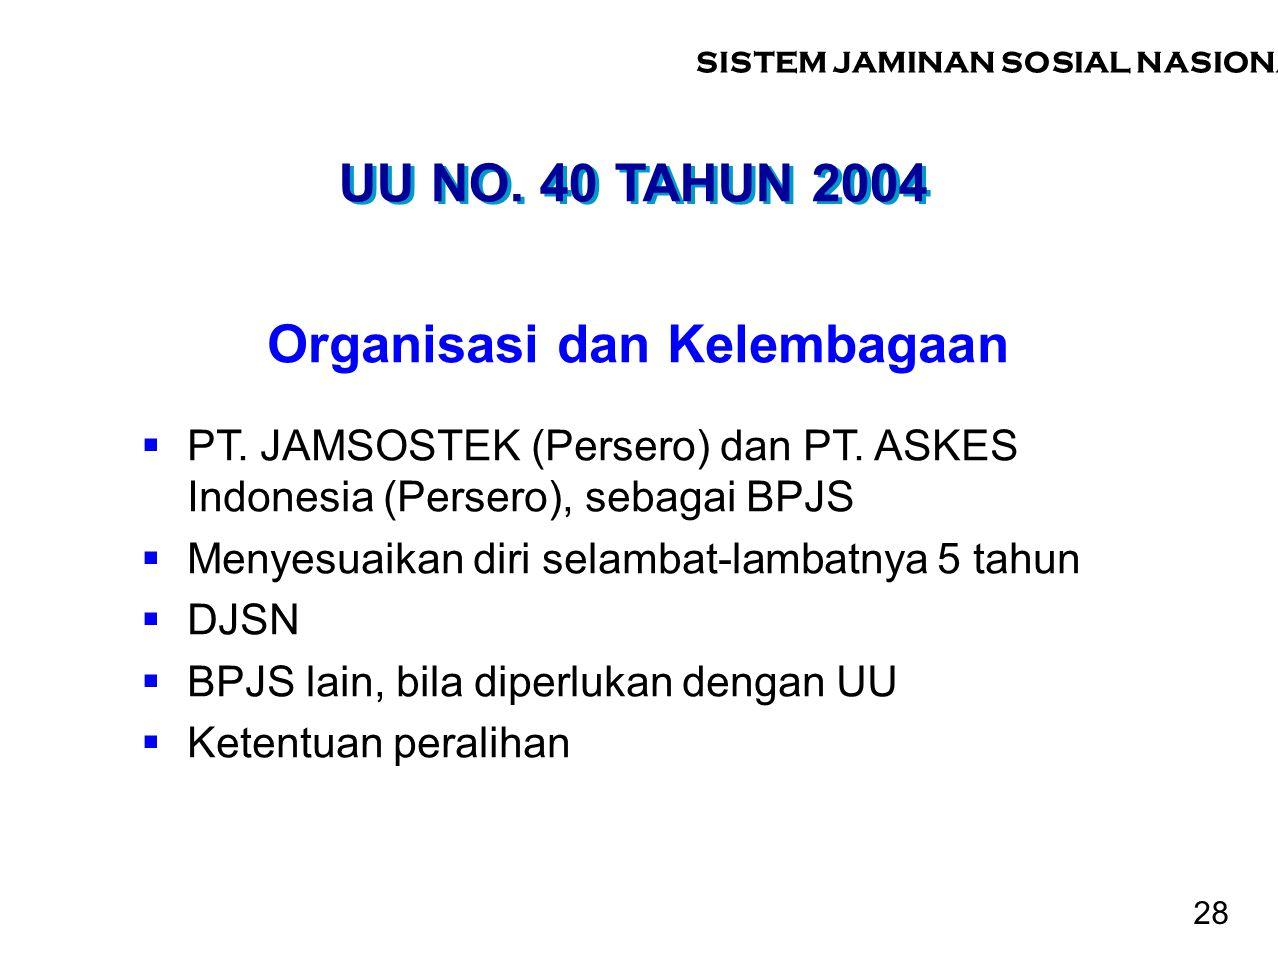 Organisasi dan Kelembagaan  PT. JAMSOSTEK (Persero) dan PT. ASKES Indonesia (Persero), sebagai BPJS  Menyesuaikan diri selambat-lambatnya 5 tahun 